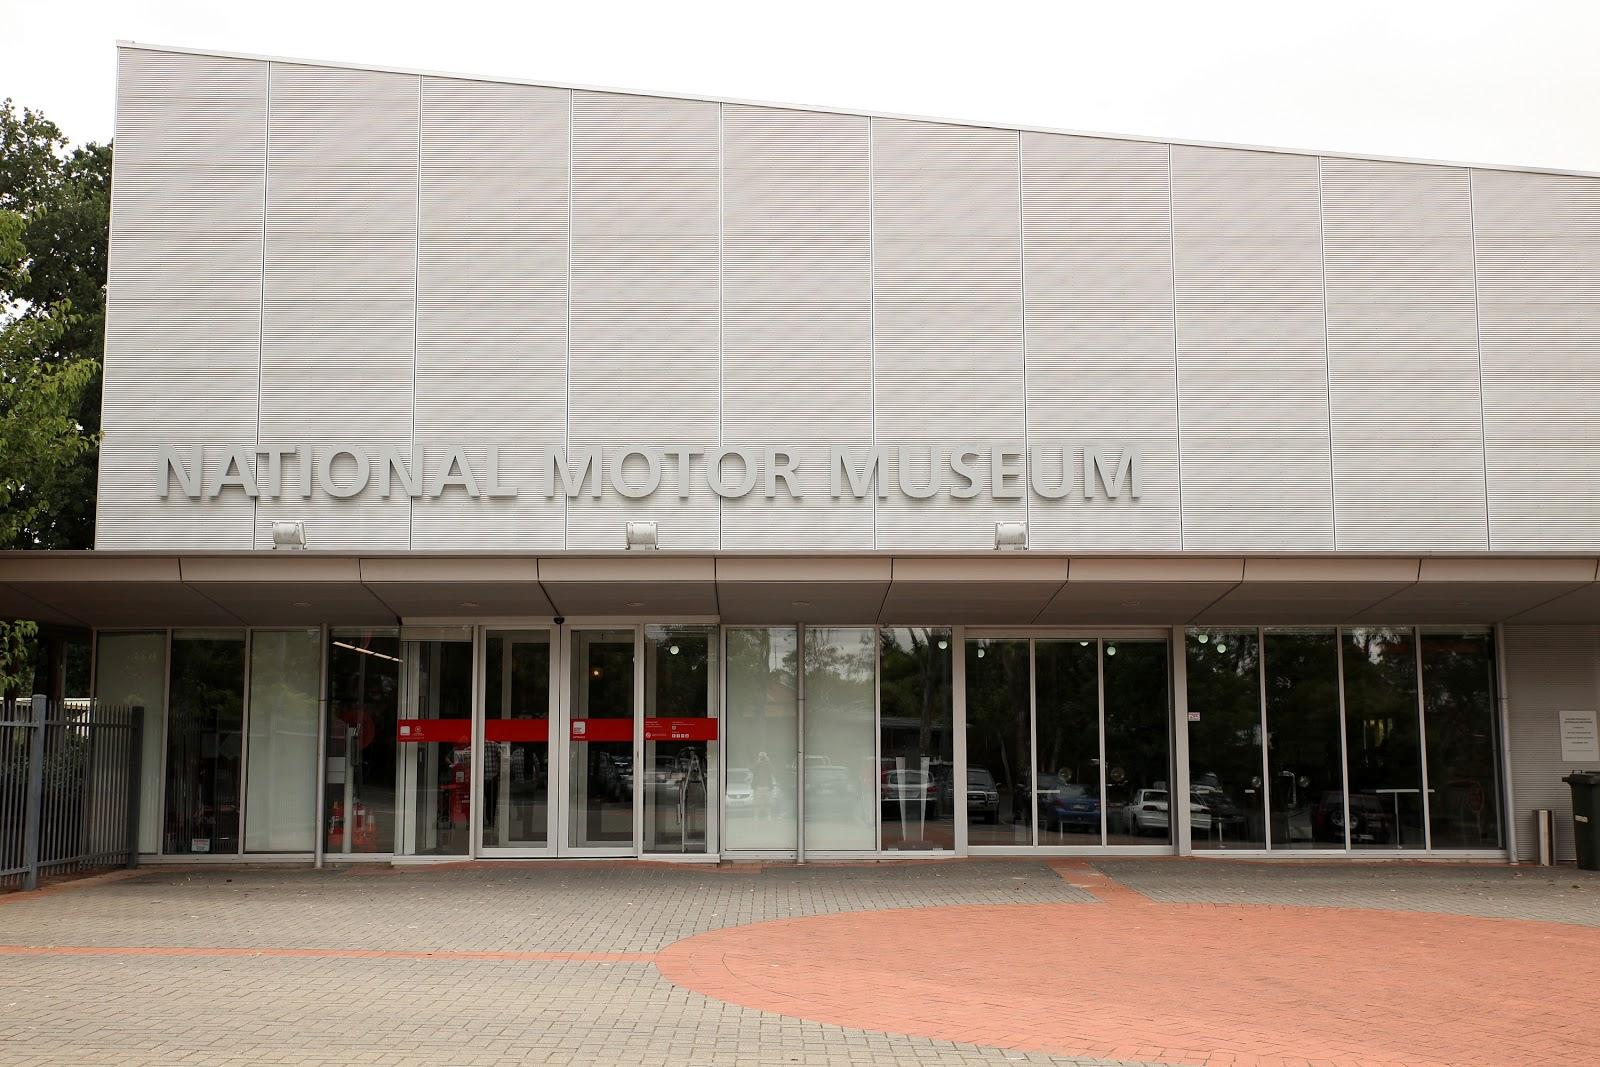 Rower 2012 National Motor Museum Birdwood